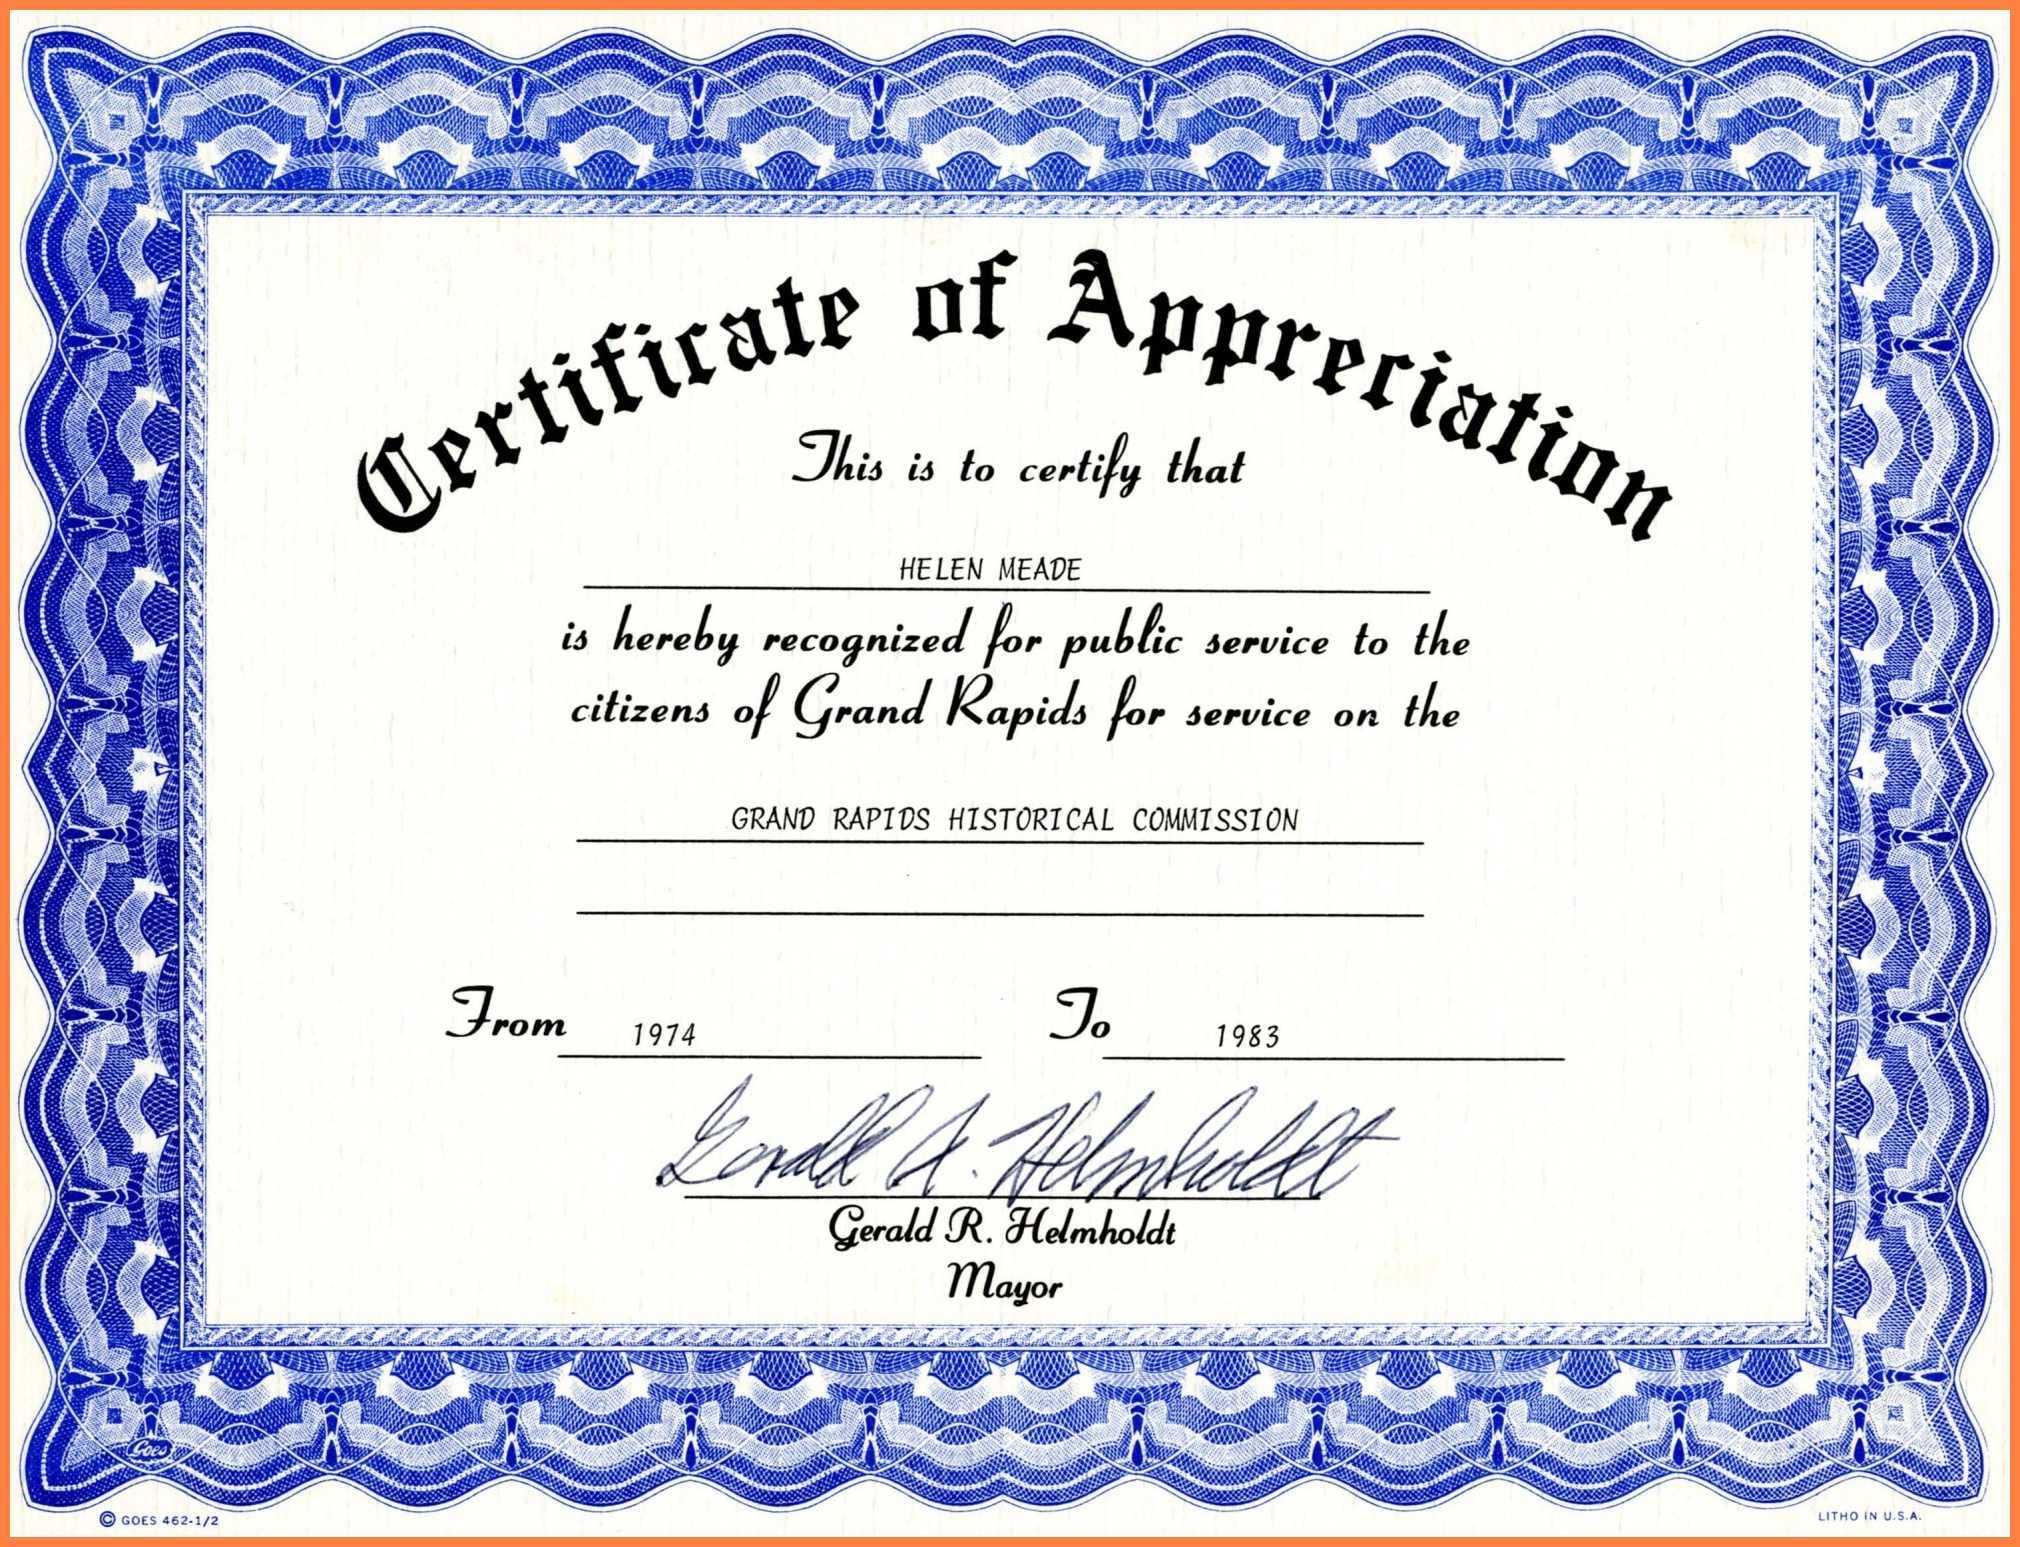 Certificate Of Appreciation Template Word Free Download With Certificate Templates For Word Free Downloads